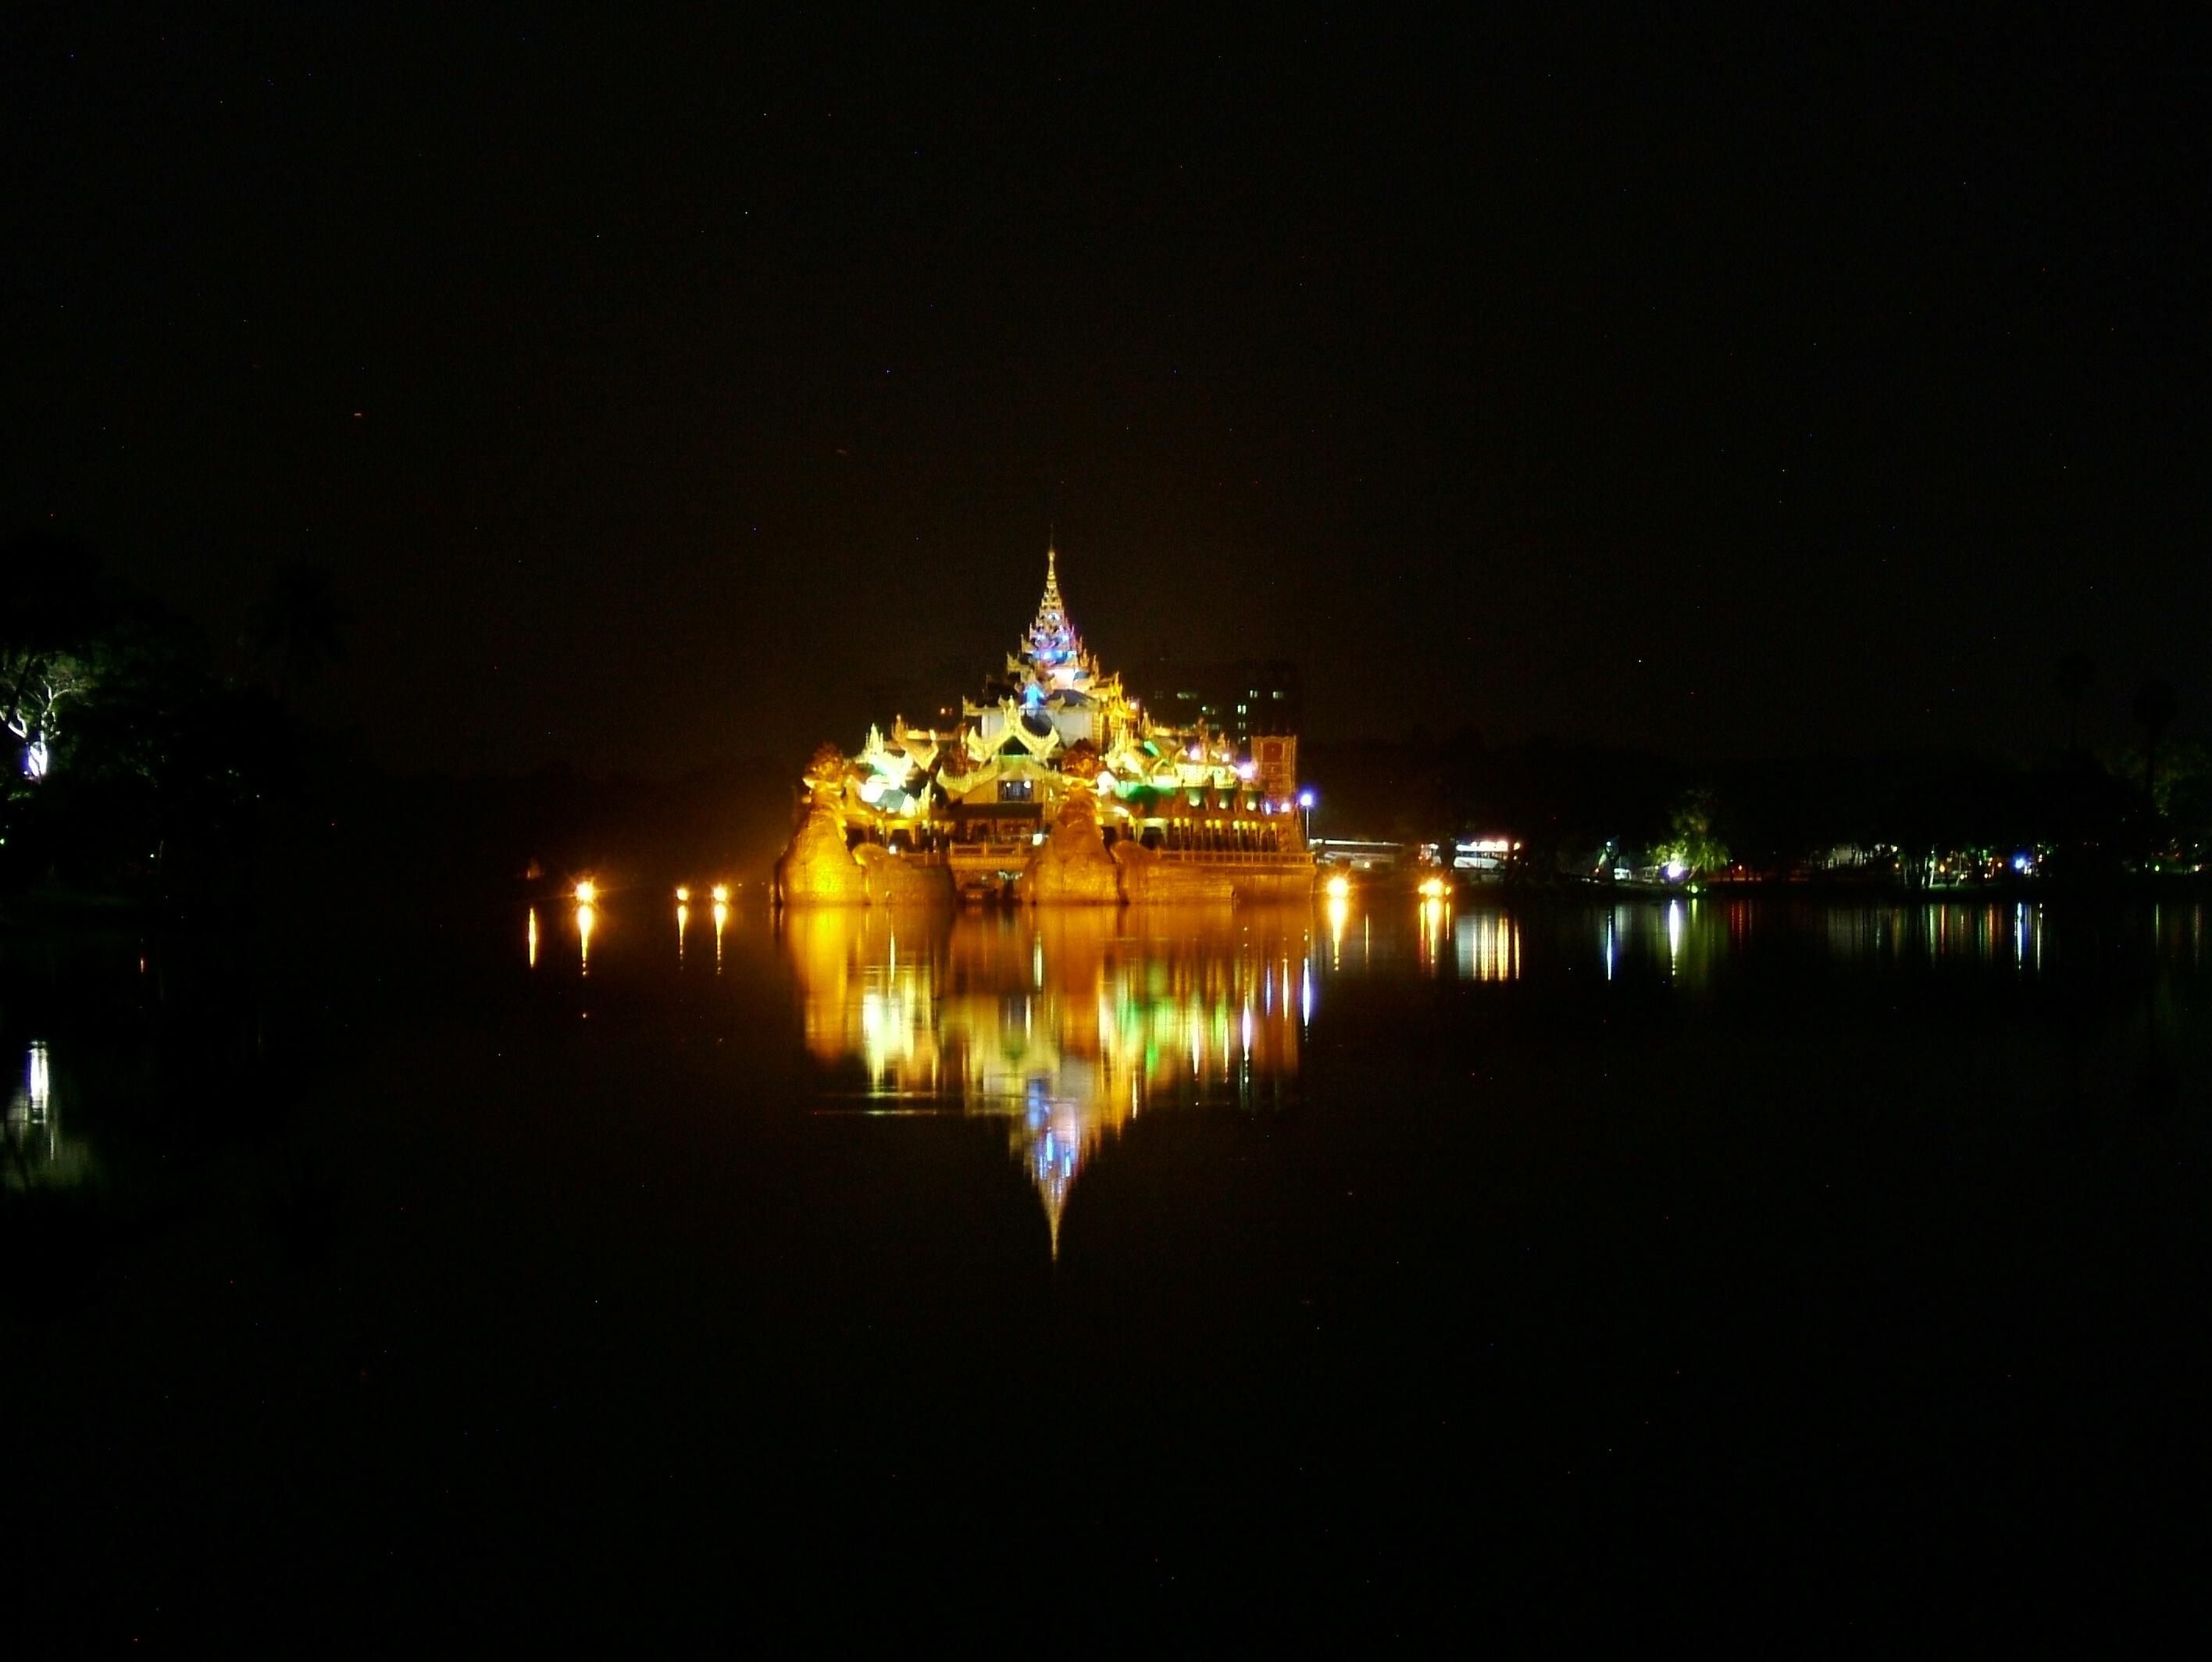 Myanmar Yangon Kandawgyi Palace Hotel royal barge Nov 2004 07